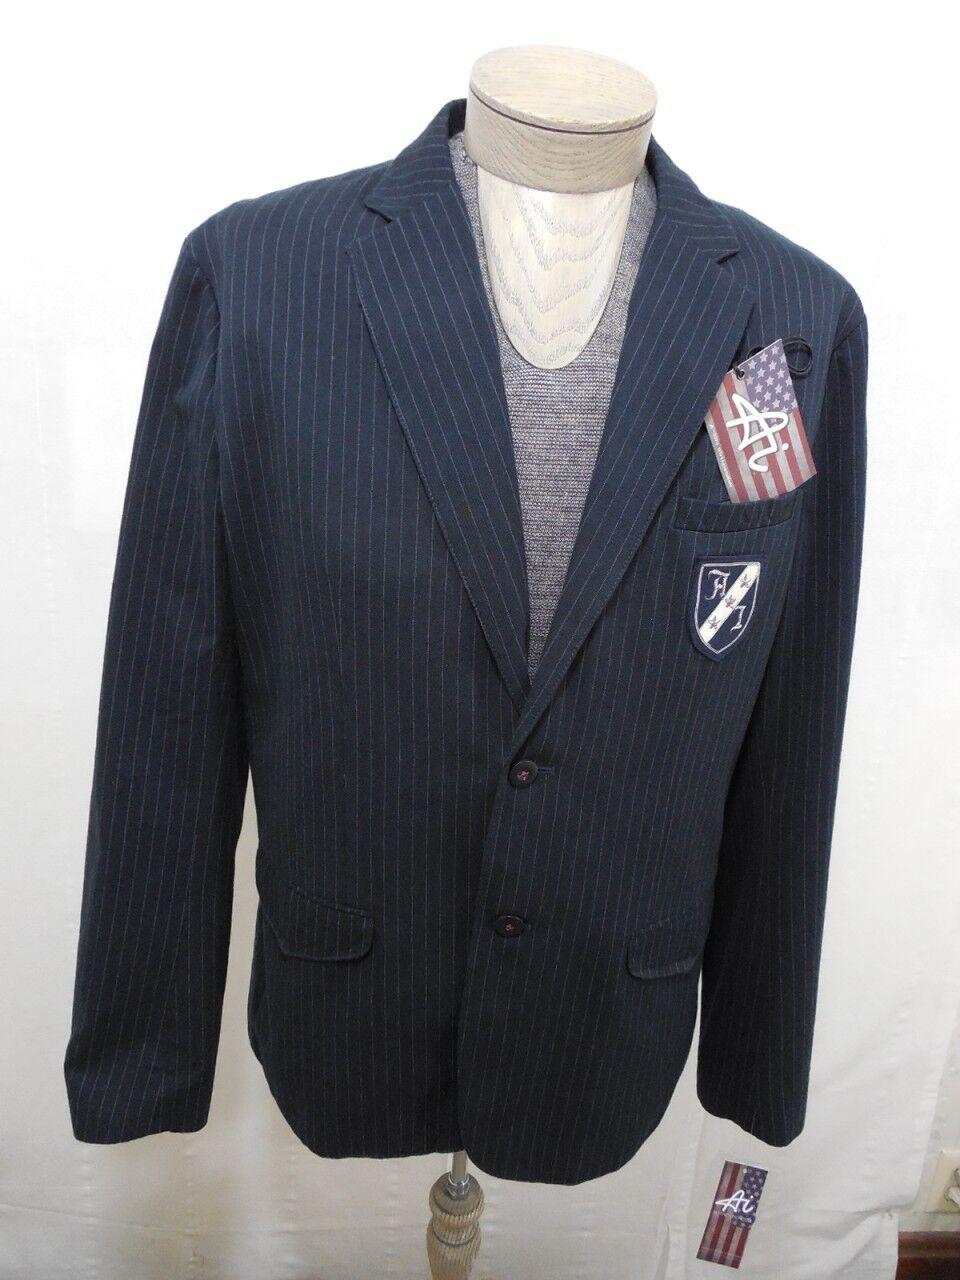 Authentic Icon American Idol Men's 100% Cotton Coat Blazer Navy Pinstripe M